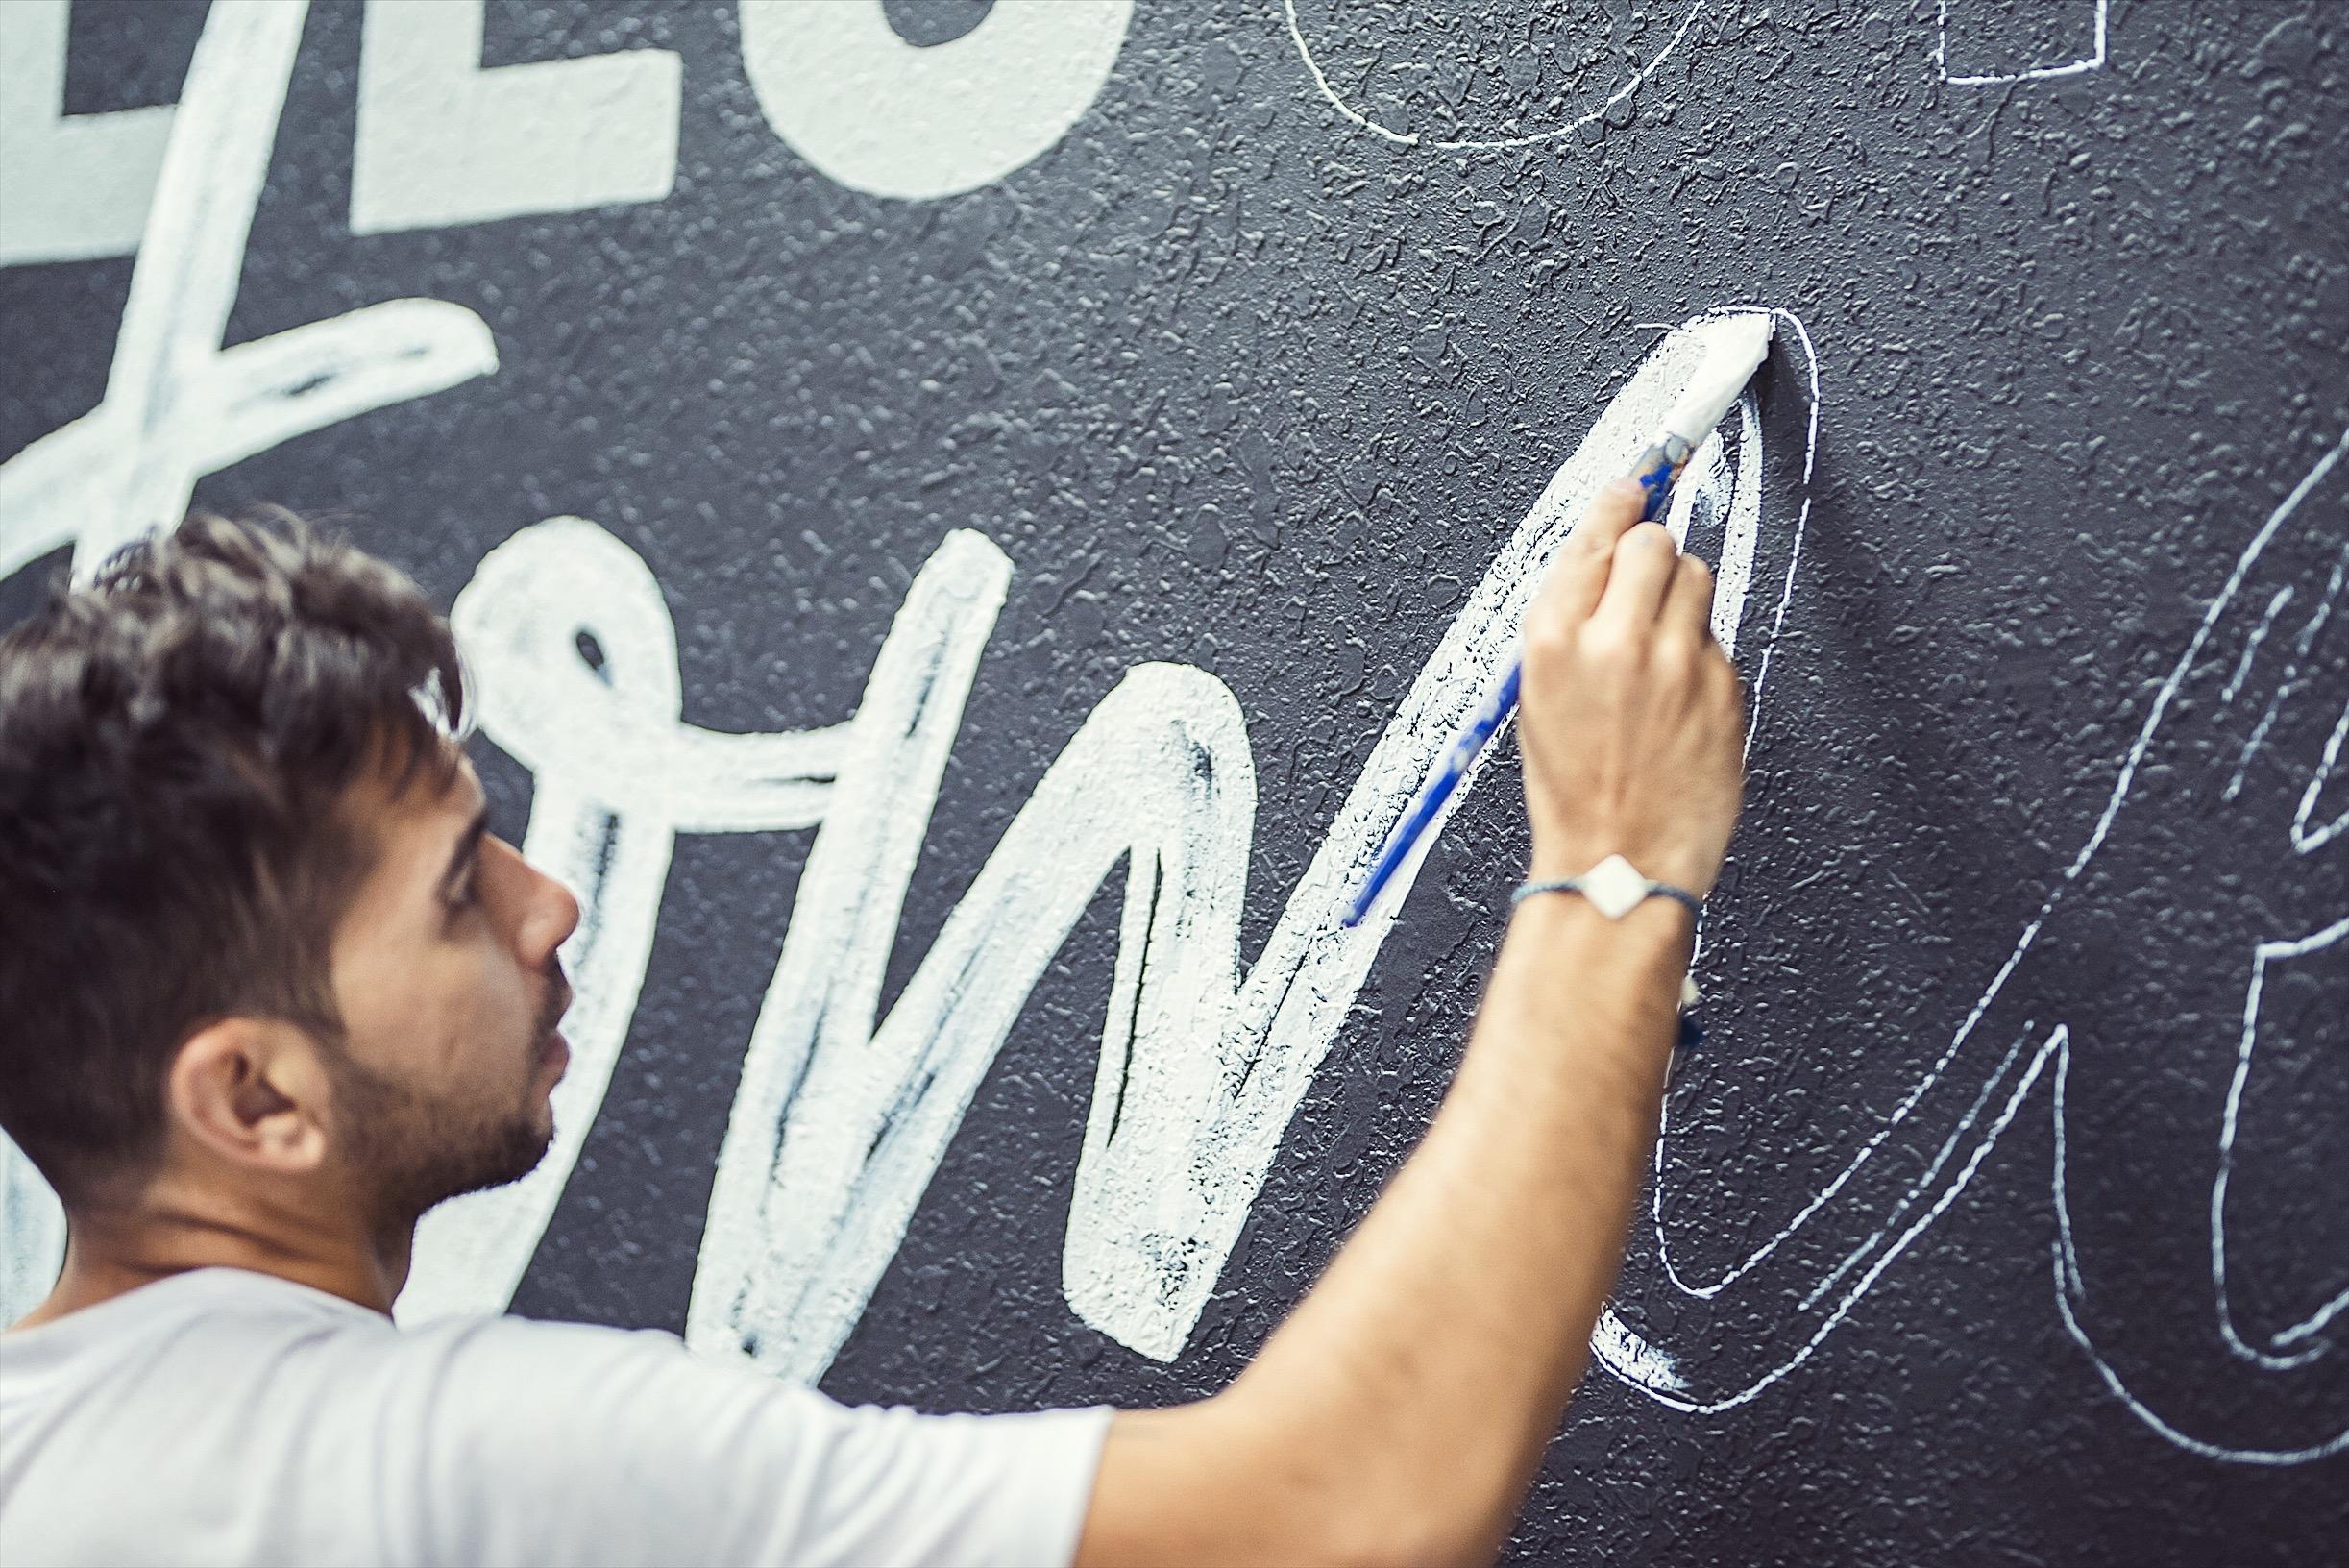 Leo-Gomez-Studi-Signs-Murals.JPG